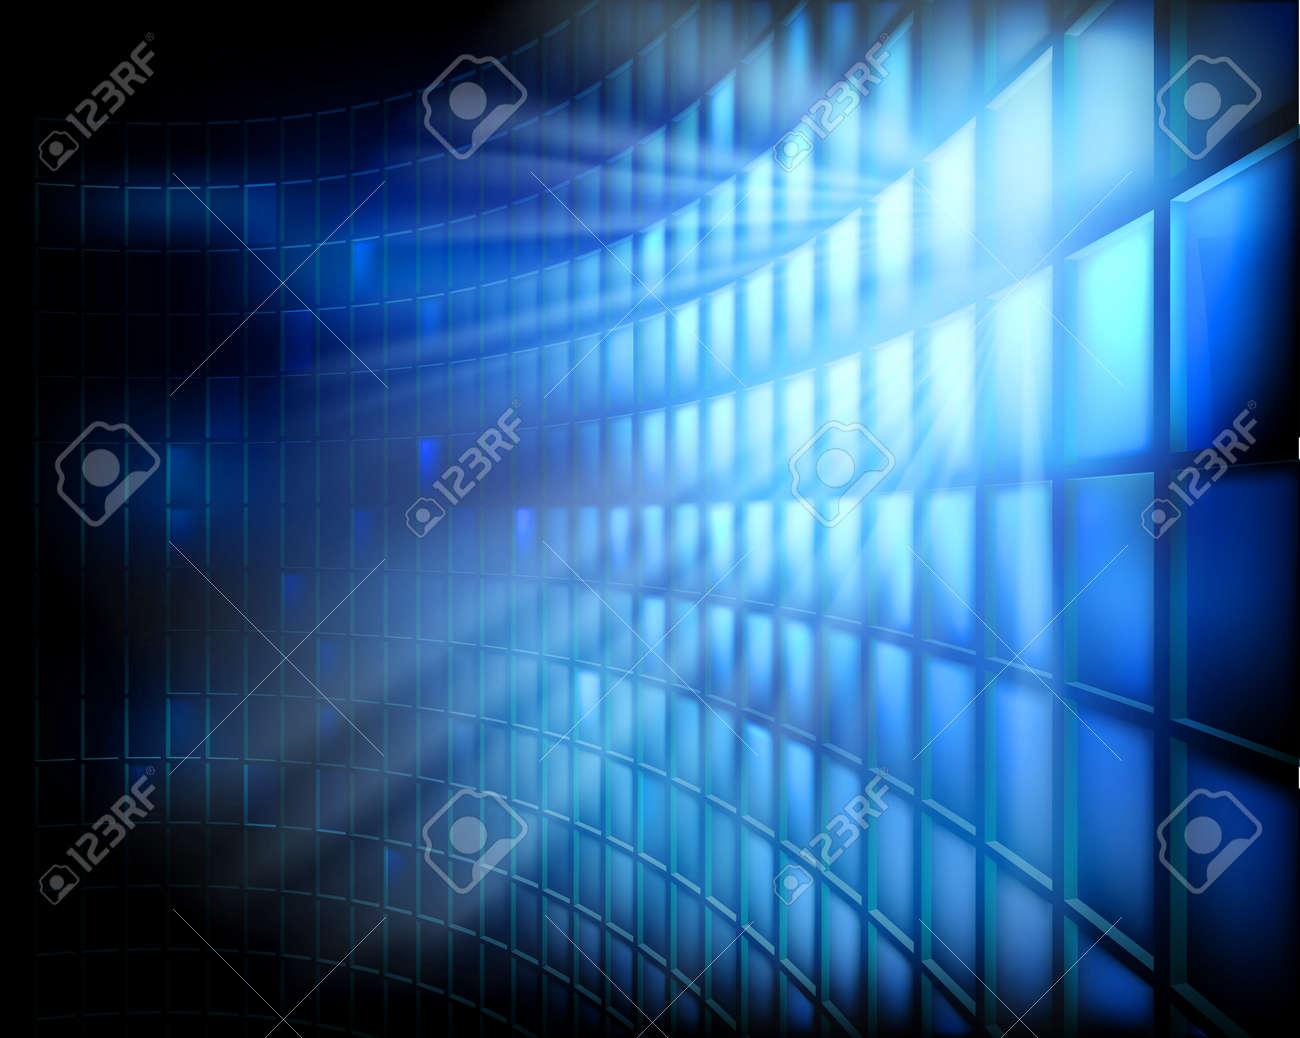 Led display. Vector illustration. - 44182990